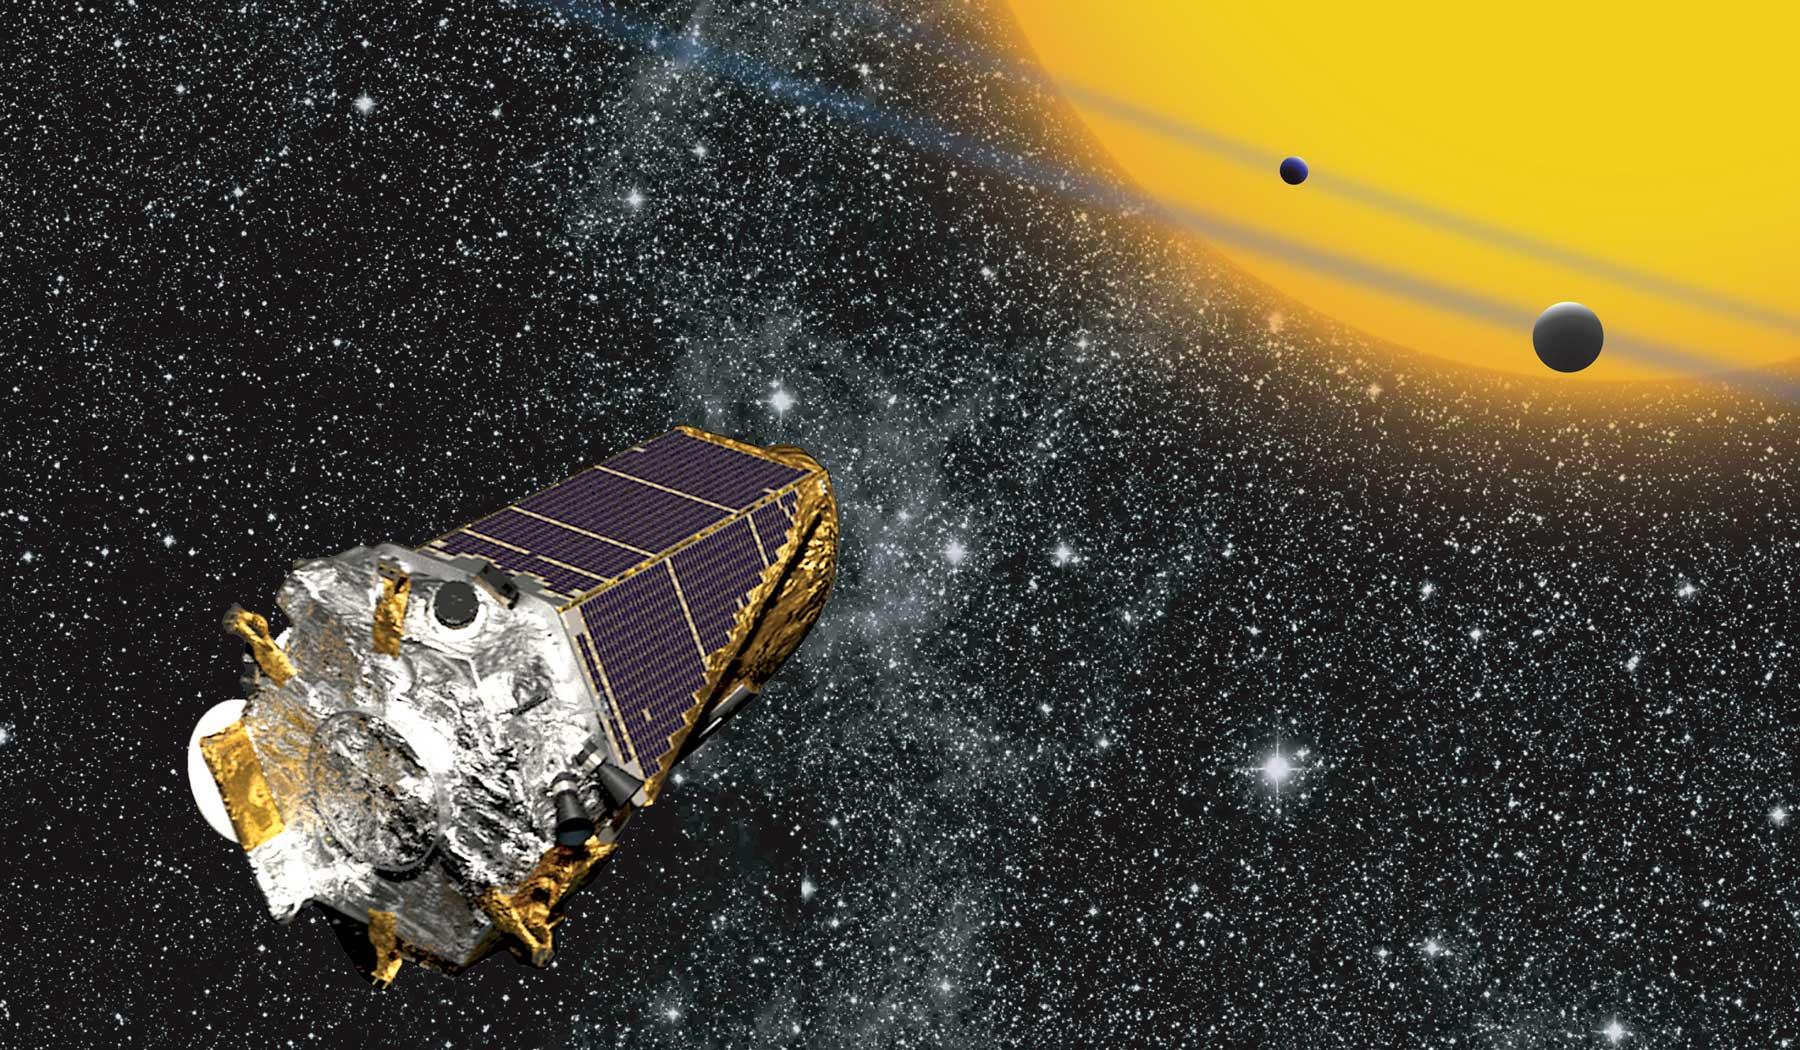 1,000 Alien Planets! NASA's Kepler Space Telescope Hits Big Milestone